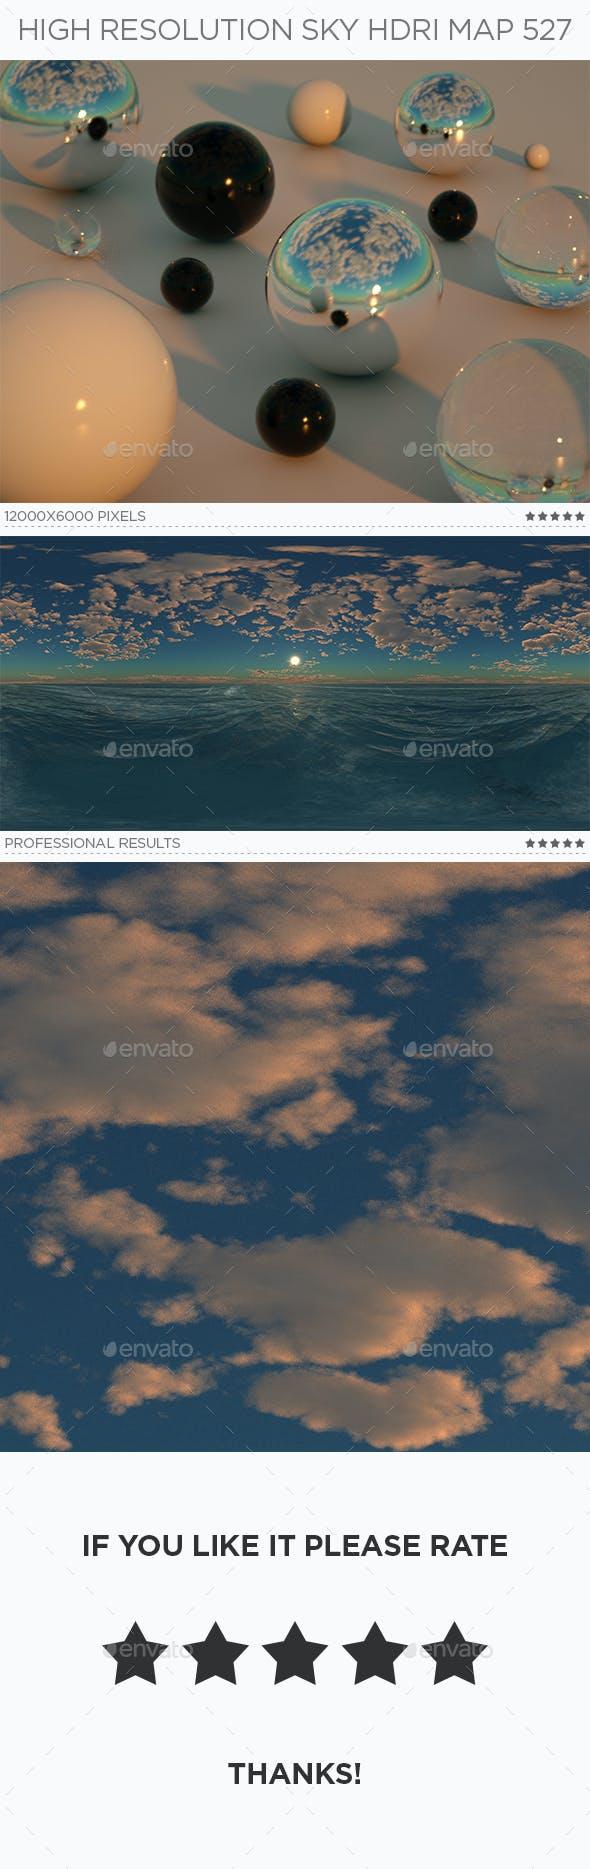 High Resolution Sky HDRi Map 527 - 3DOcean Item for Sale